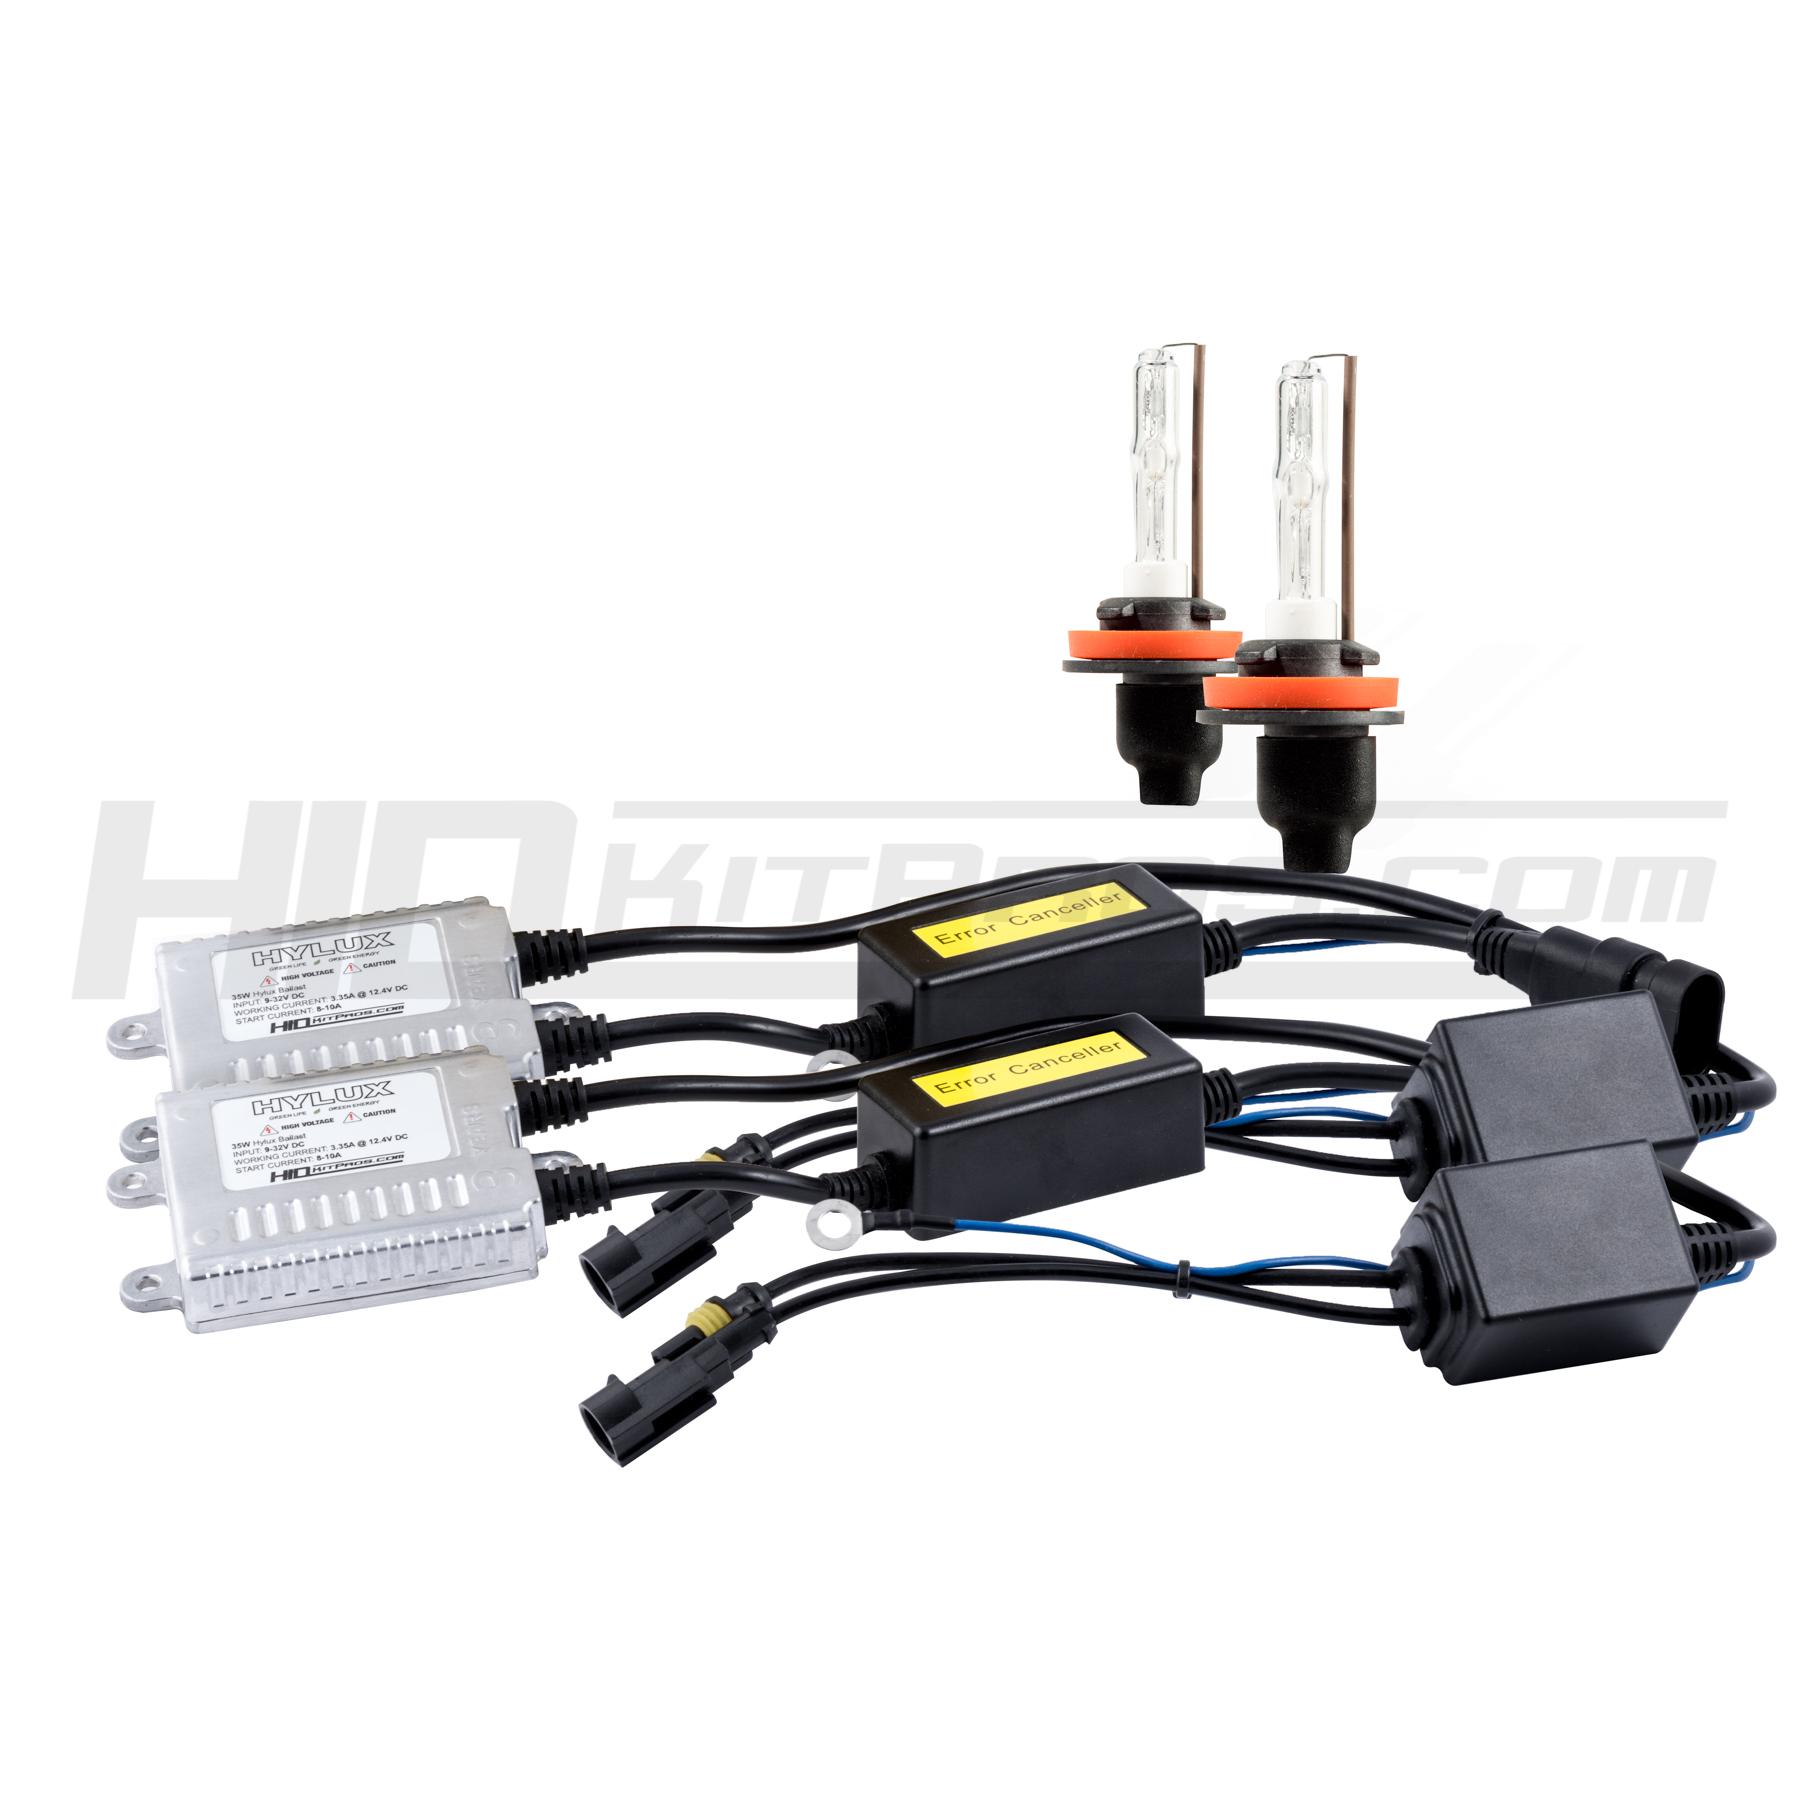 Can Bus Hid Kit Wiring Diagram - Wiring Diagram K7 H Hid Headlight Wiring Diagram on